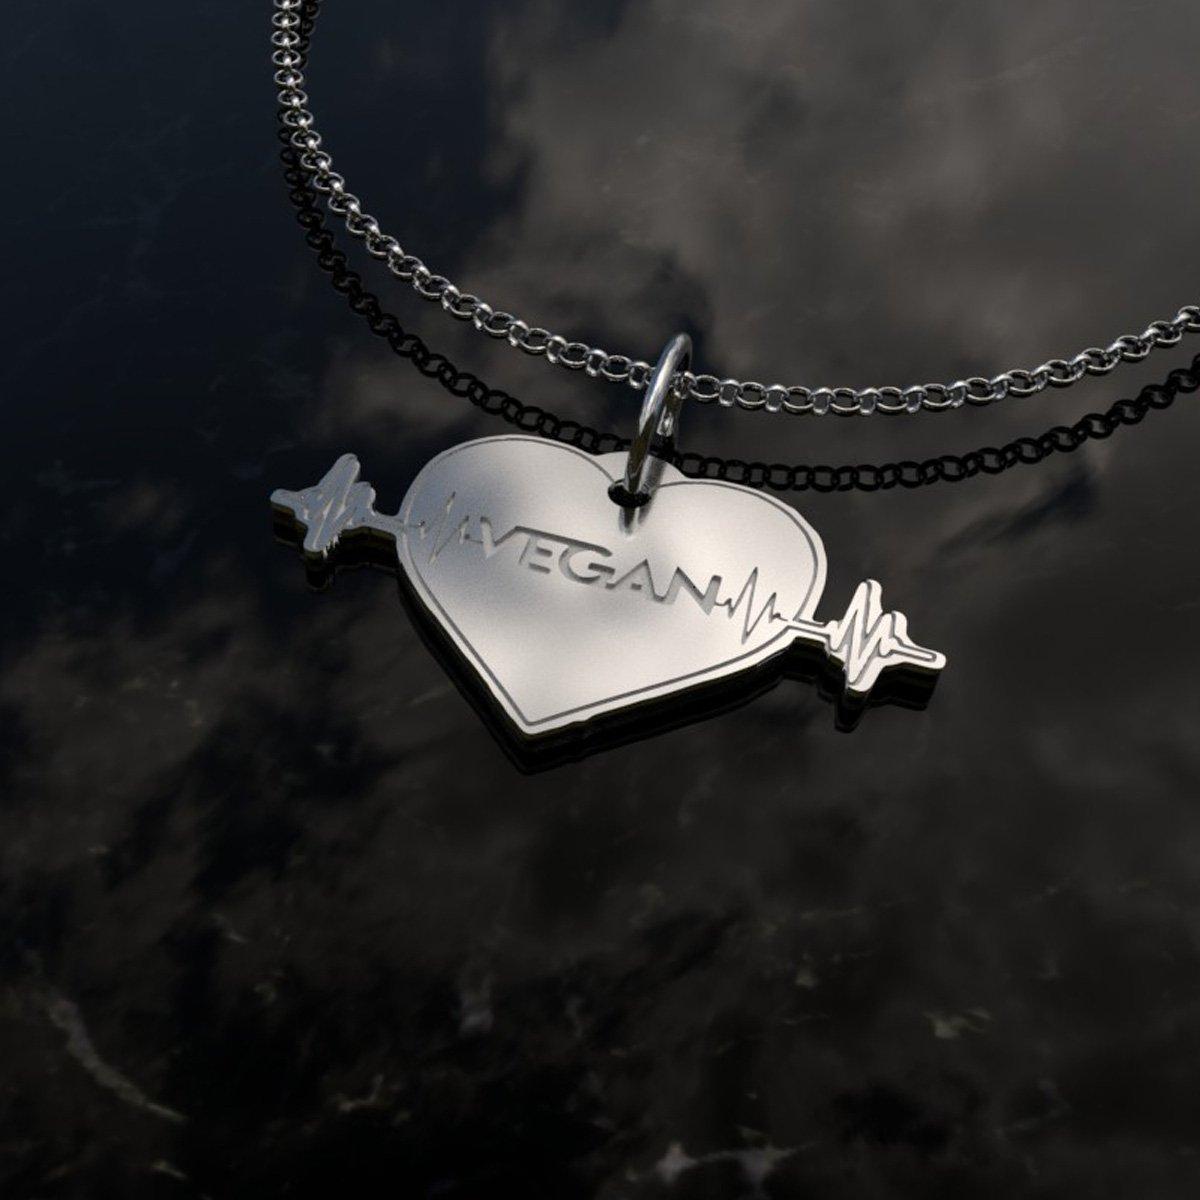 Vegan Earrings-Star Charms-Vegan Jewelry-Gift-Birthday-Anniversary-Wedding-Personalized-Eco Friendly